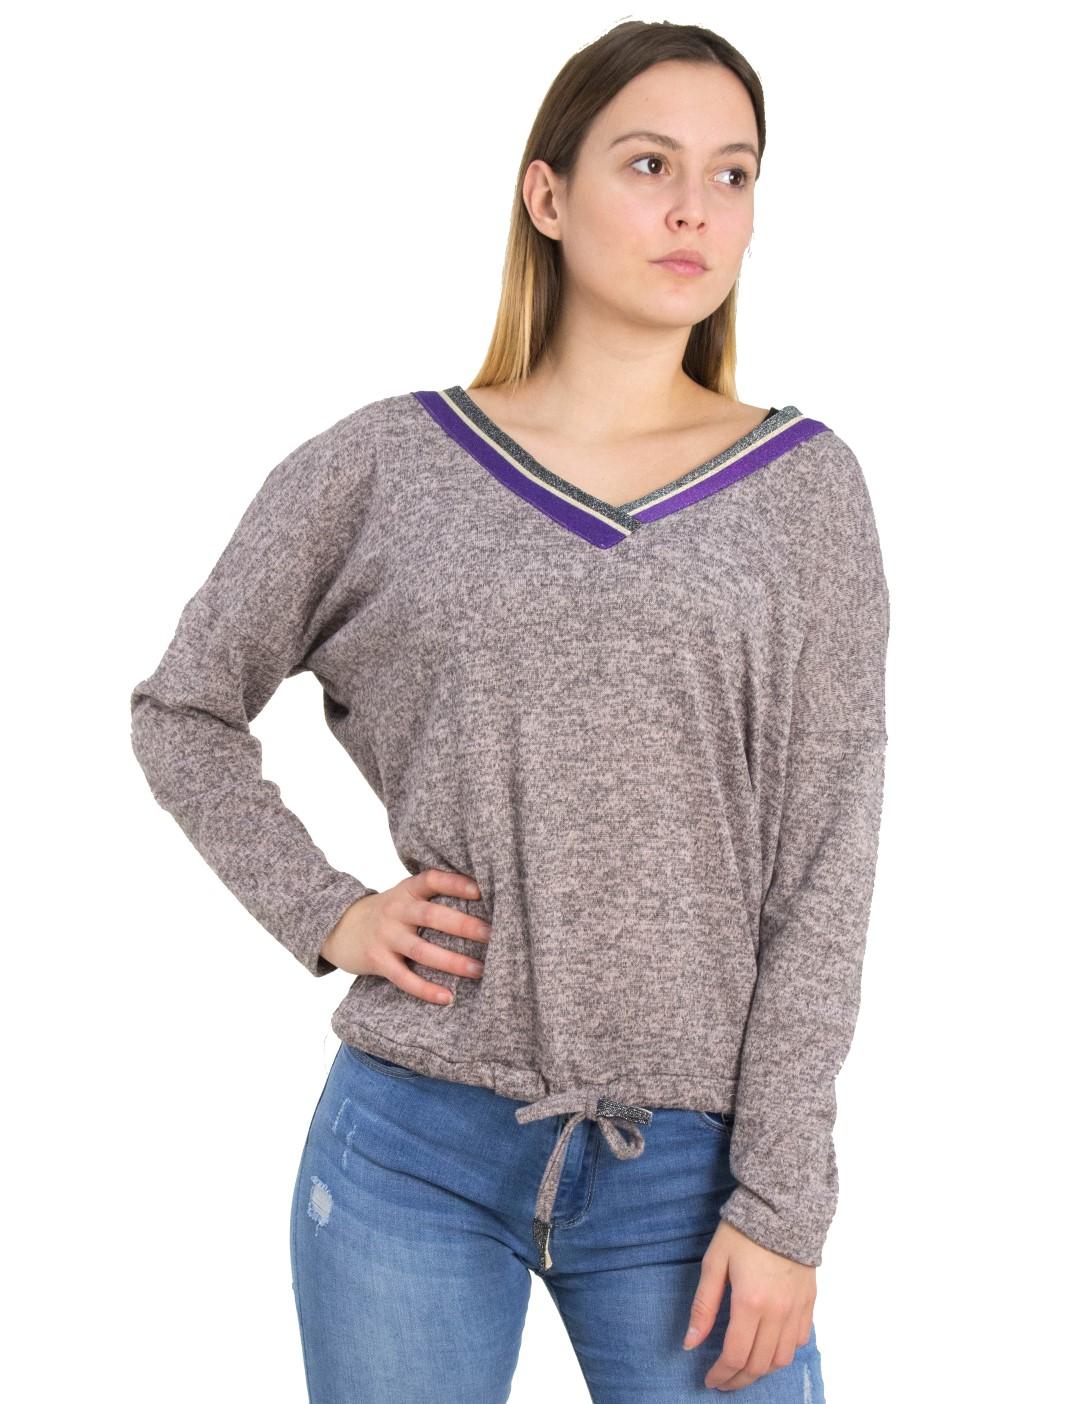 96c0a80f3ff1 Γυναικεία ροζ μακρυμάνικη μπλούζα Ve Benissimo 39479L - Glami.gr